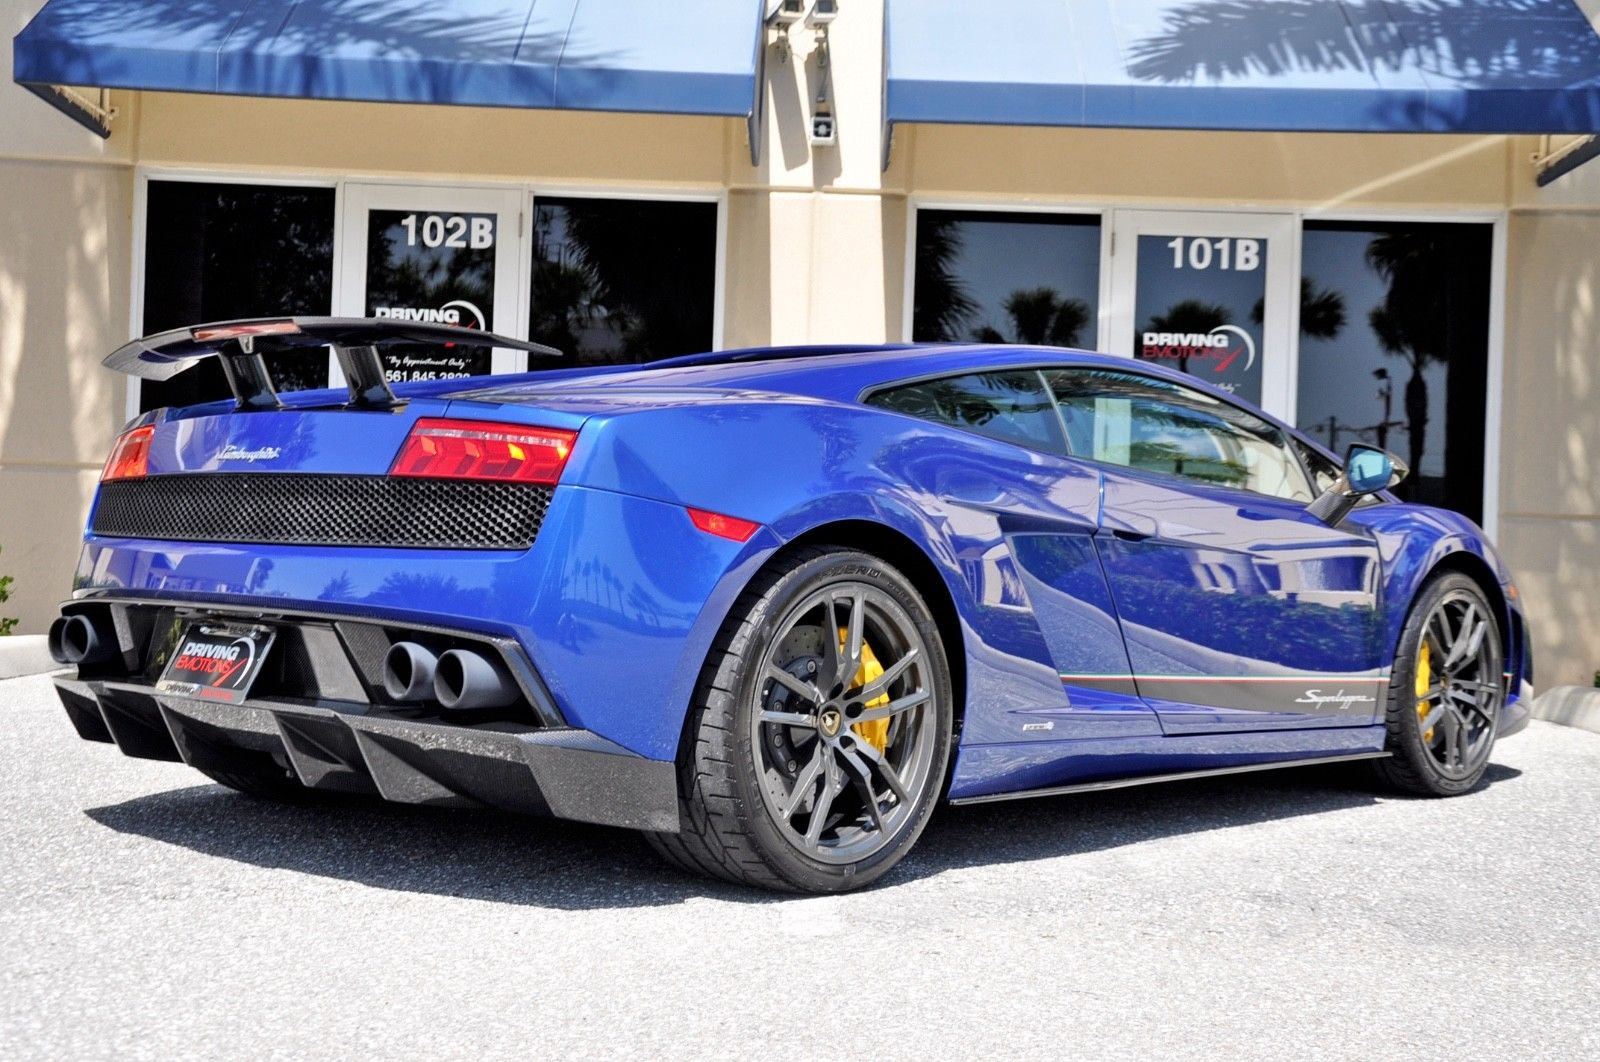 Amazing 2013 Lamborghini Gallardo Lp570 4 Superleggera 2013